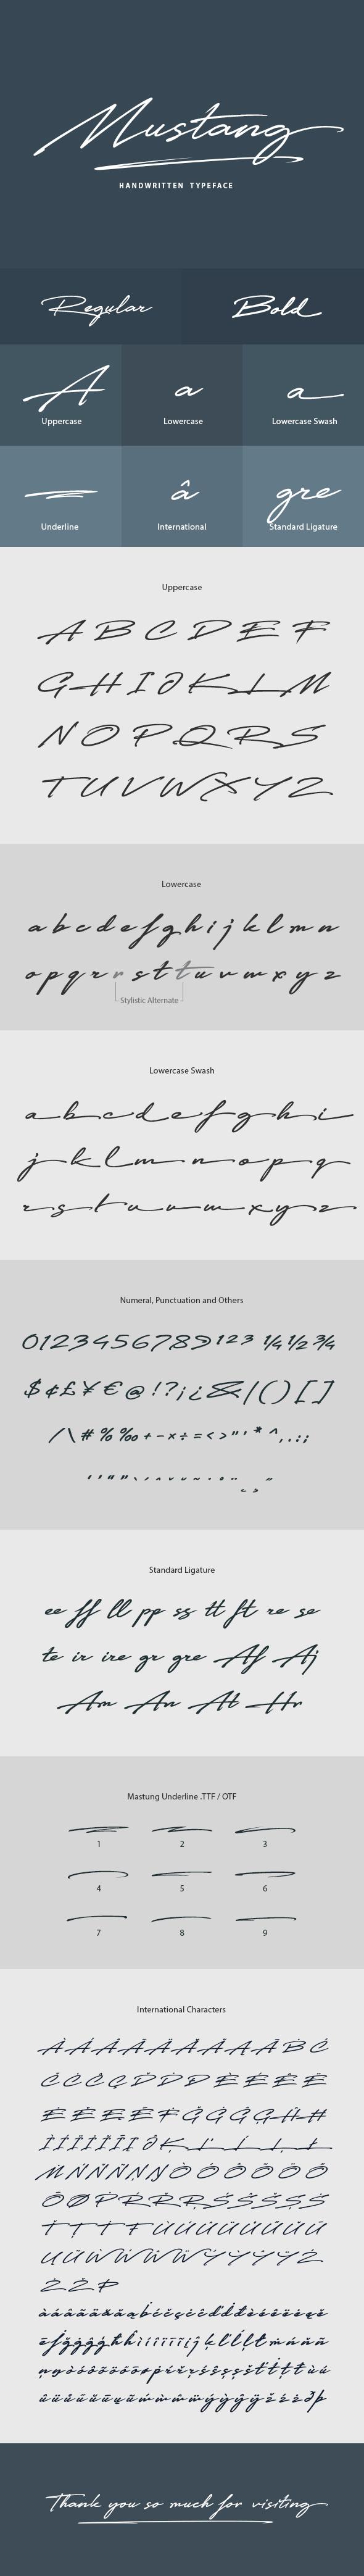 Mustang Font - Hand-writing Script